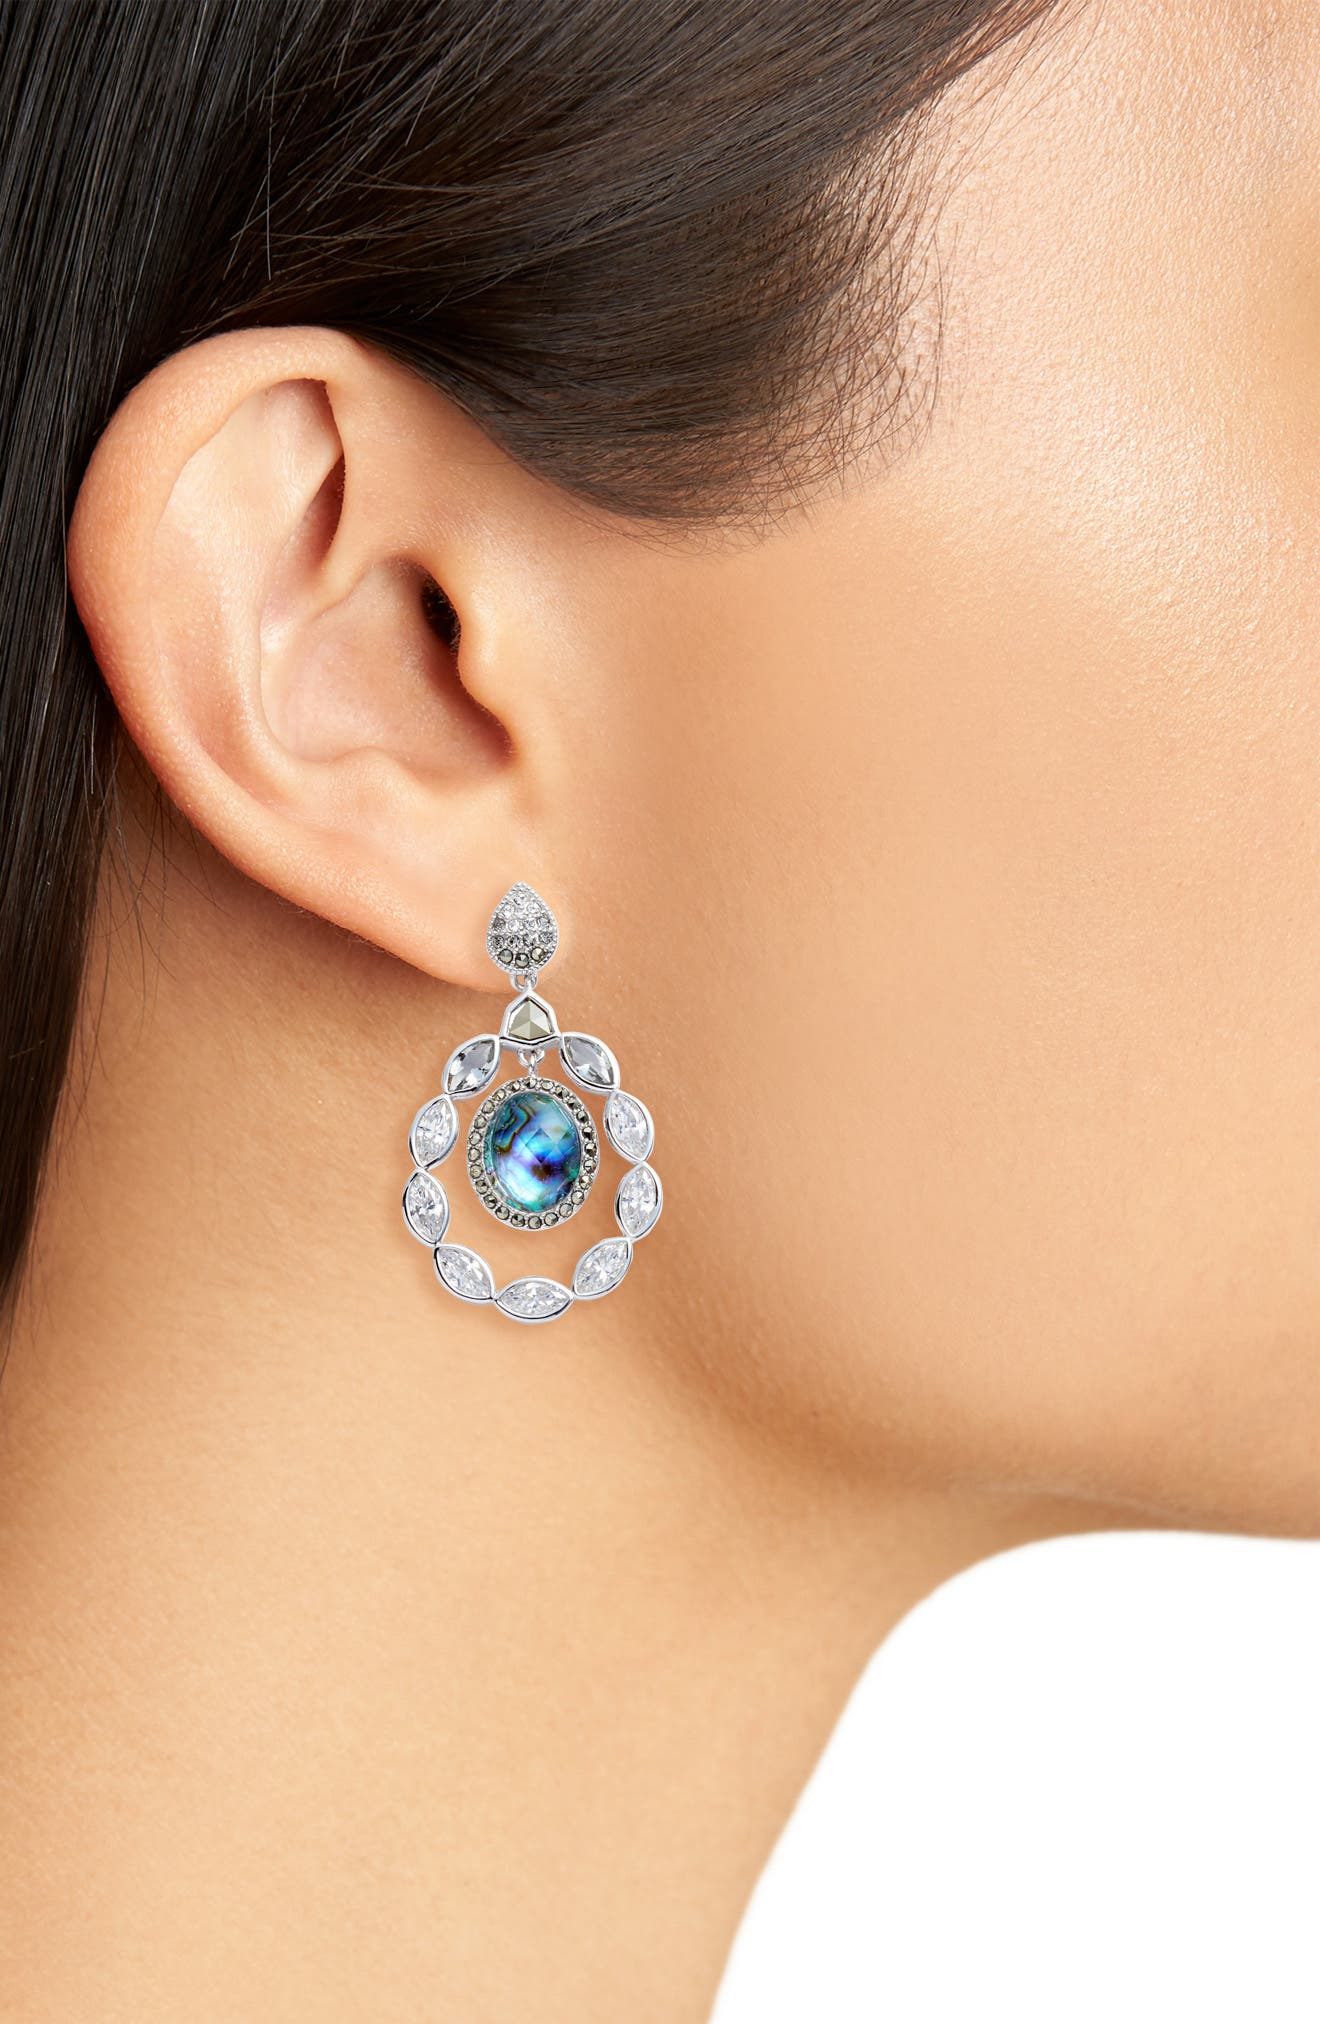 Crystal Drop Earrings,                             Alternate thumbnail 2, color,                             400